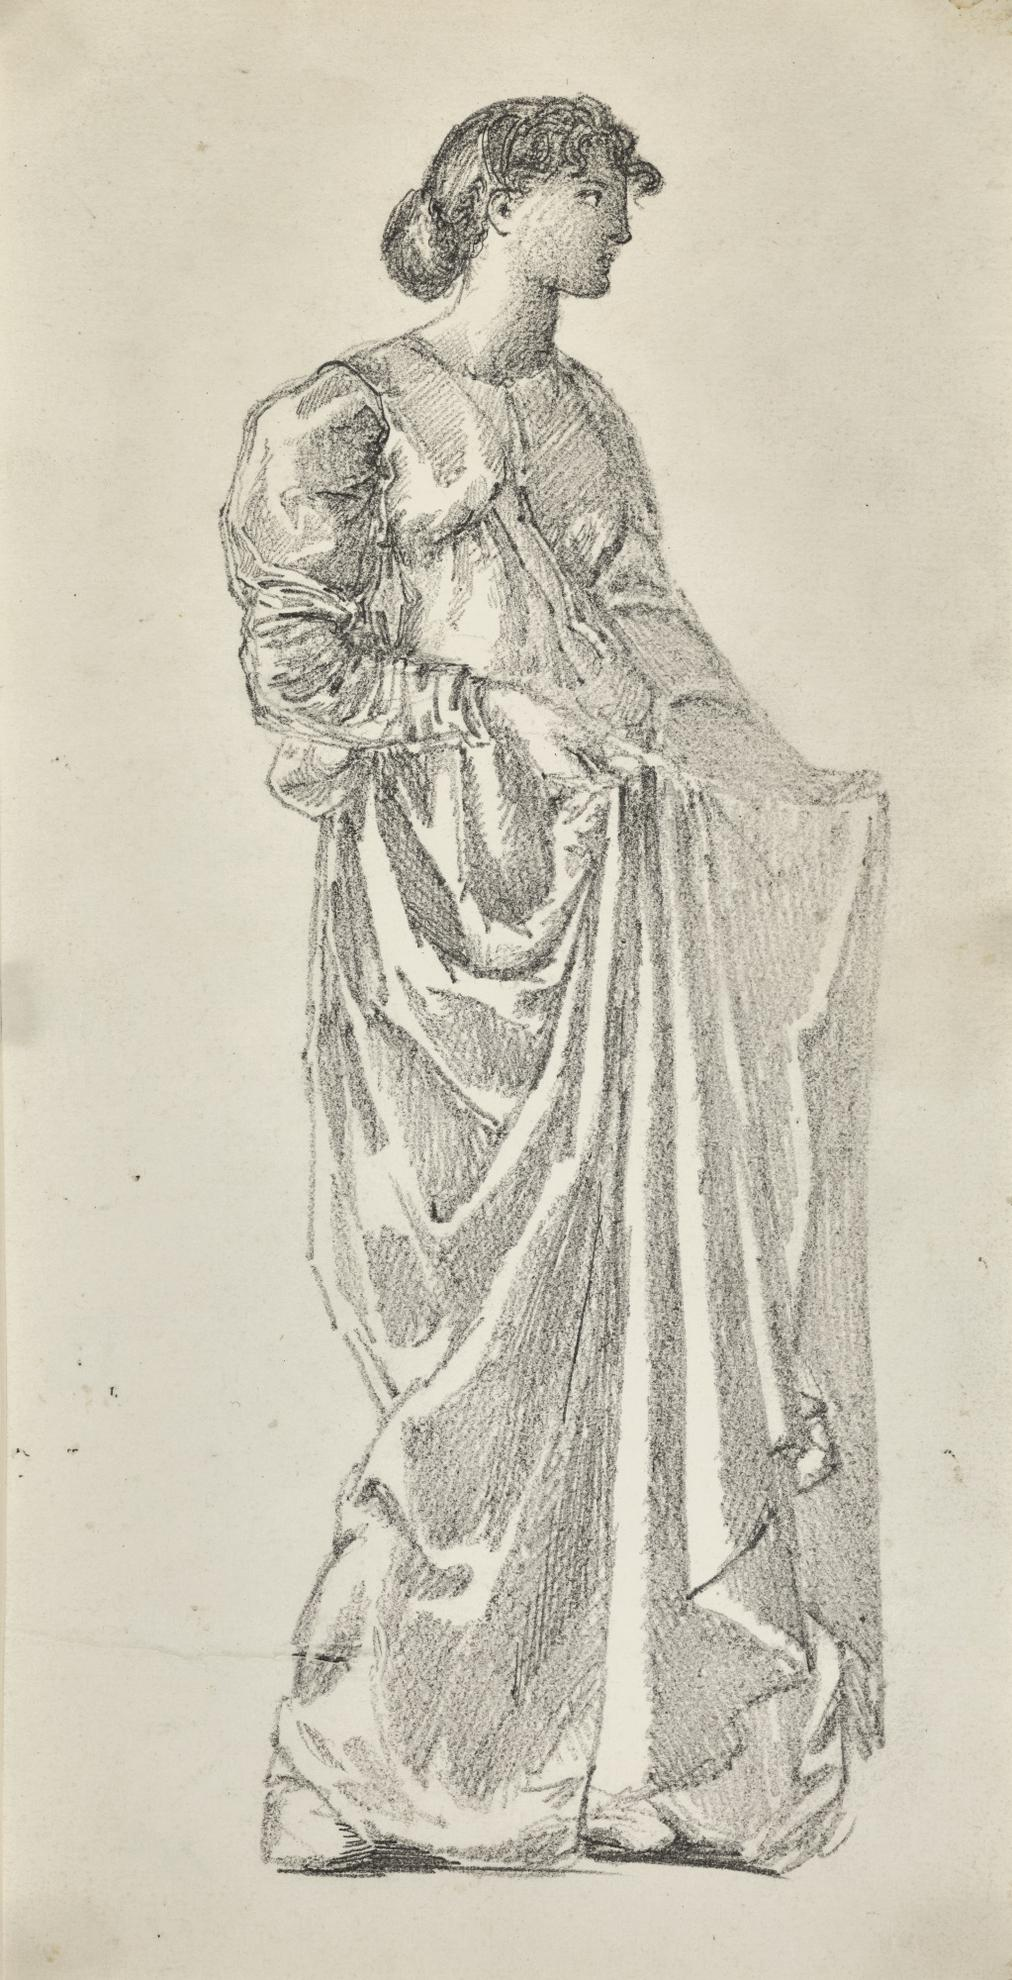 Sir Edward Coley Burne-Jones Bt. - Study For The Garland-